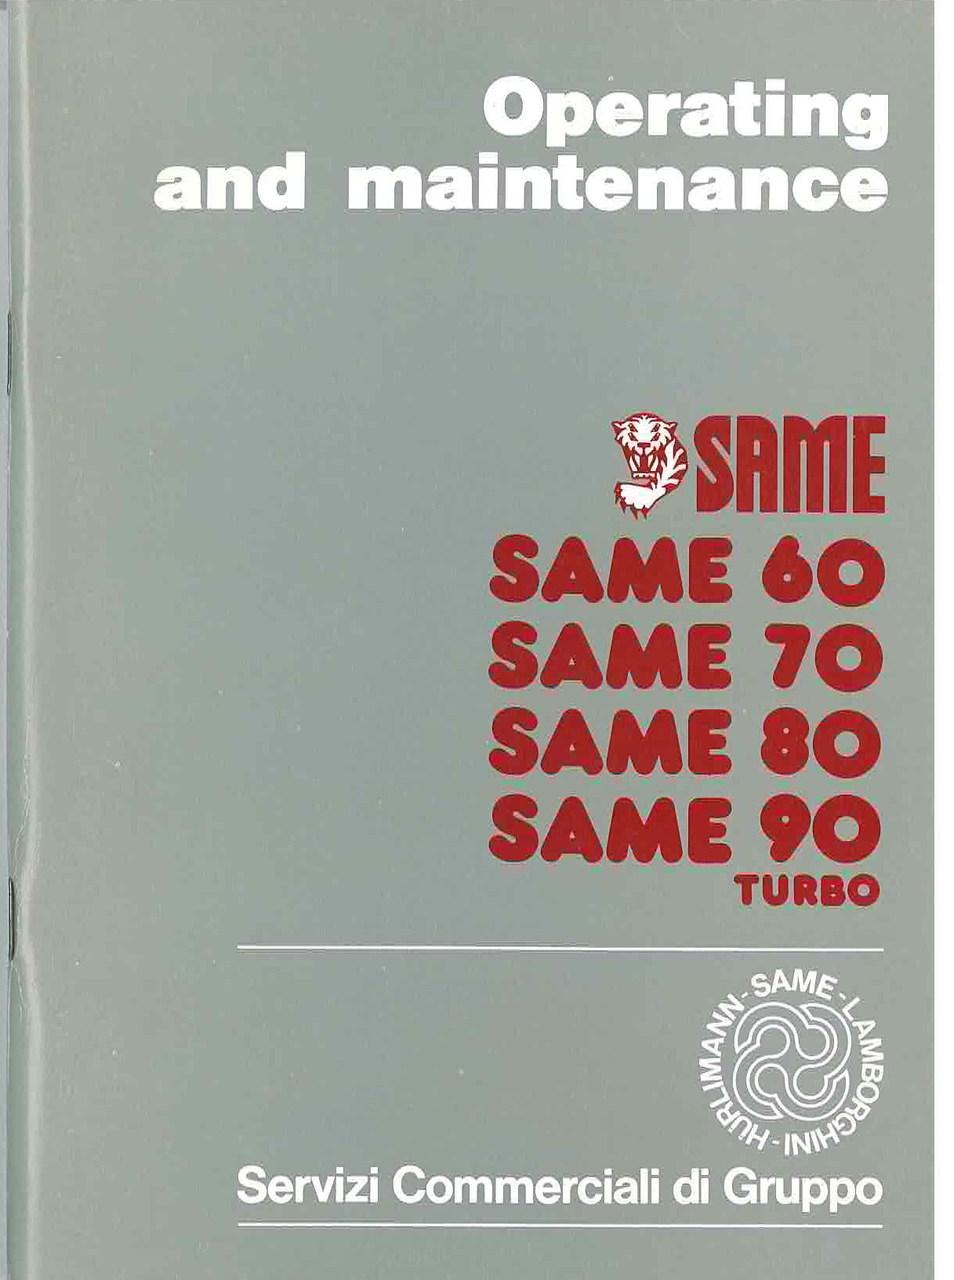 SAME 60 - 70 - 80 - 90 TURBO - Operating and maintenance